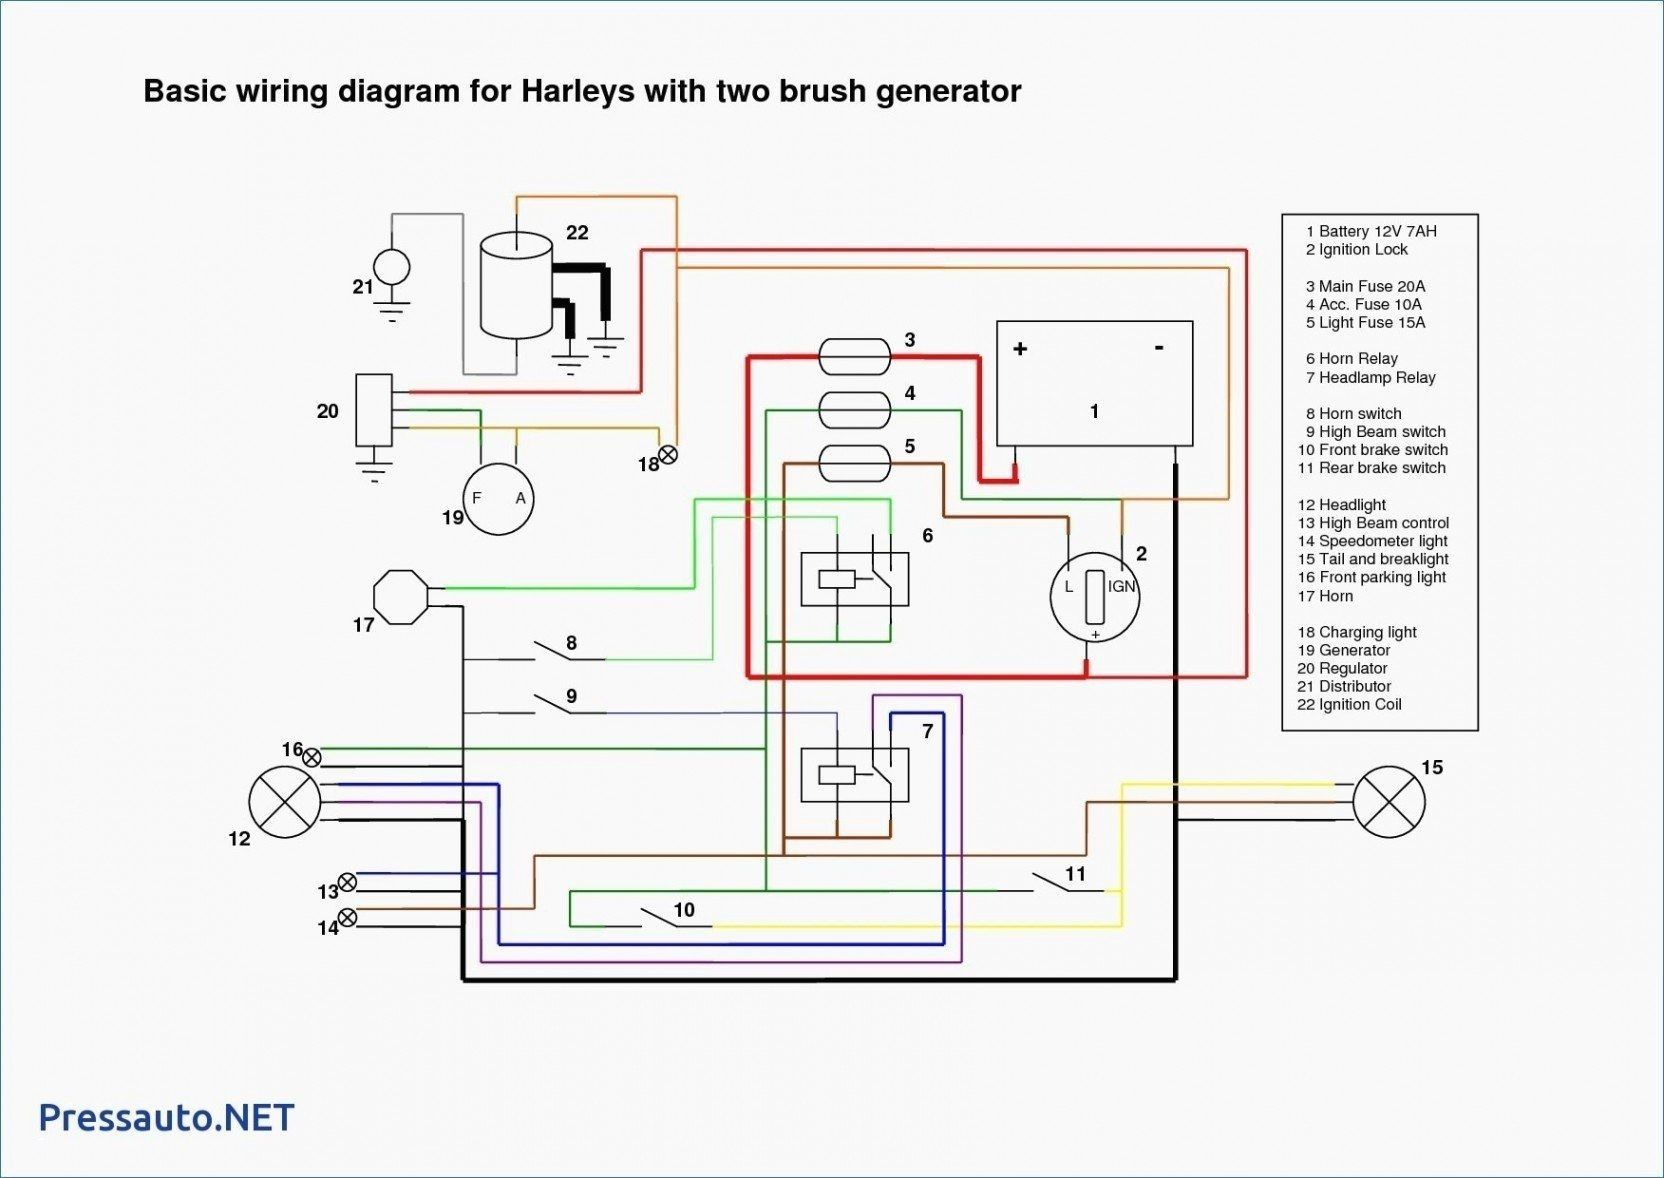 medium resolution of ford e 150 starter switch wiring for pinterest blog wiring diagram ford e 150 starter switch wiring for pinterest